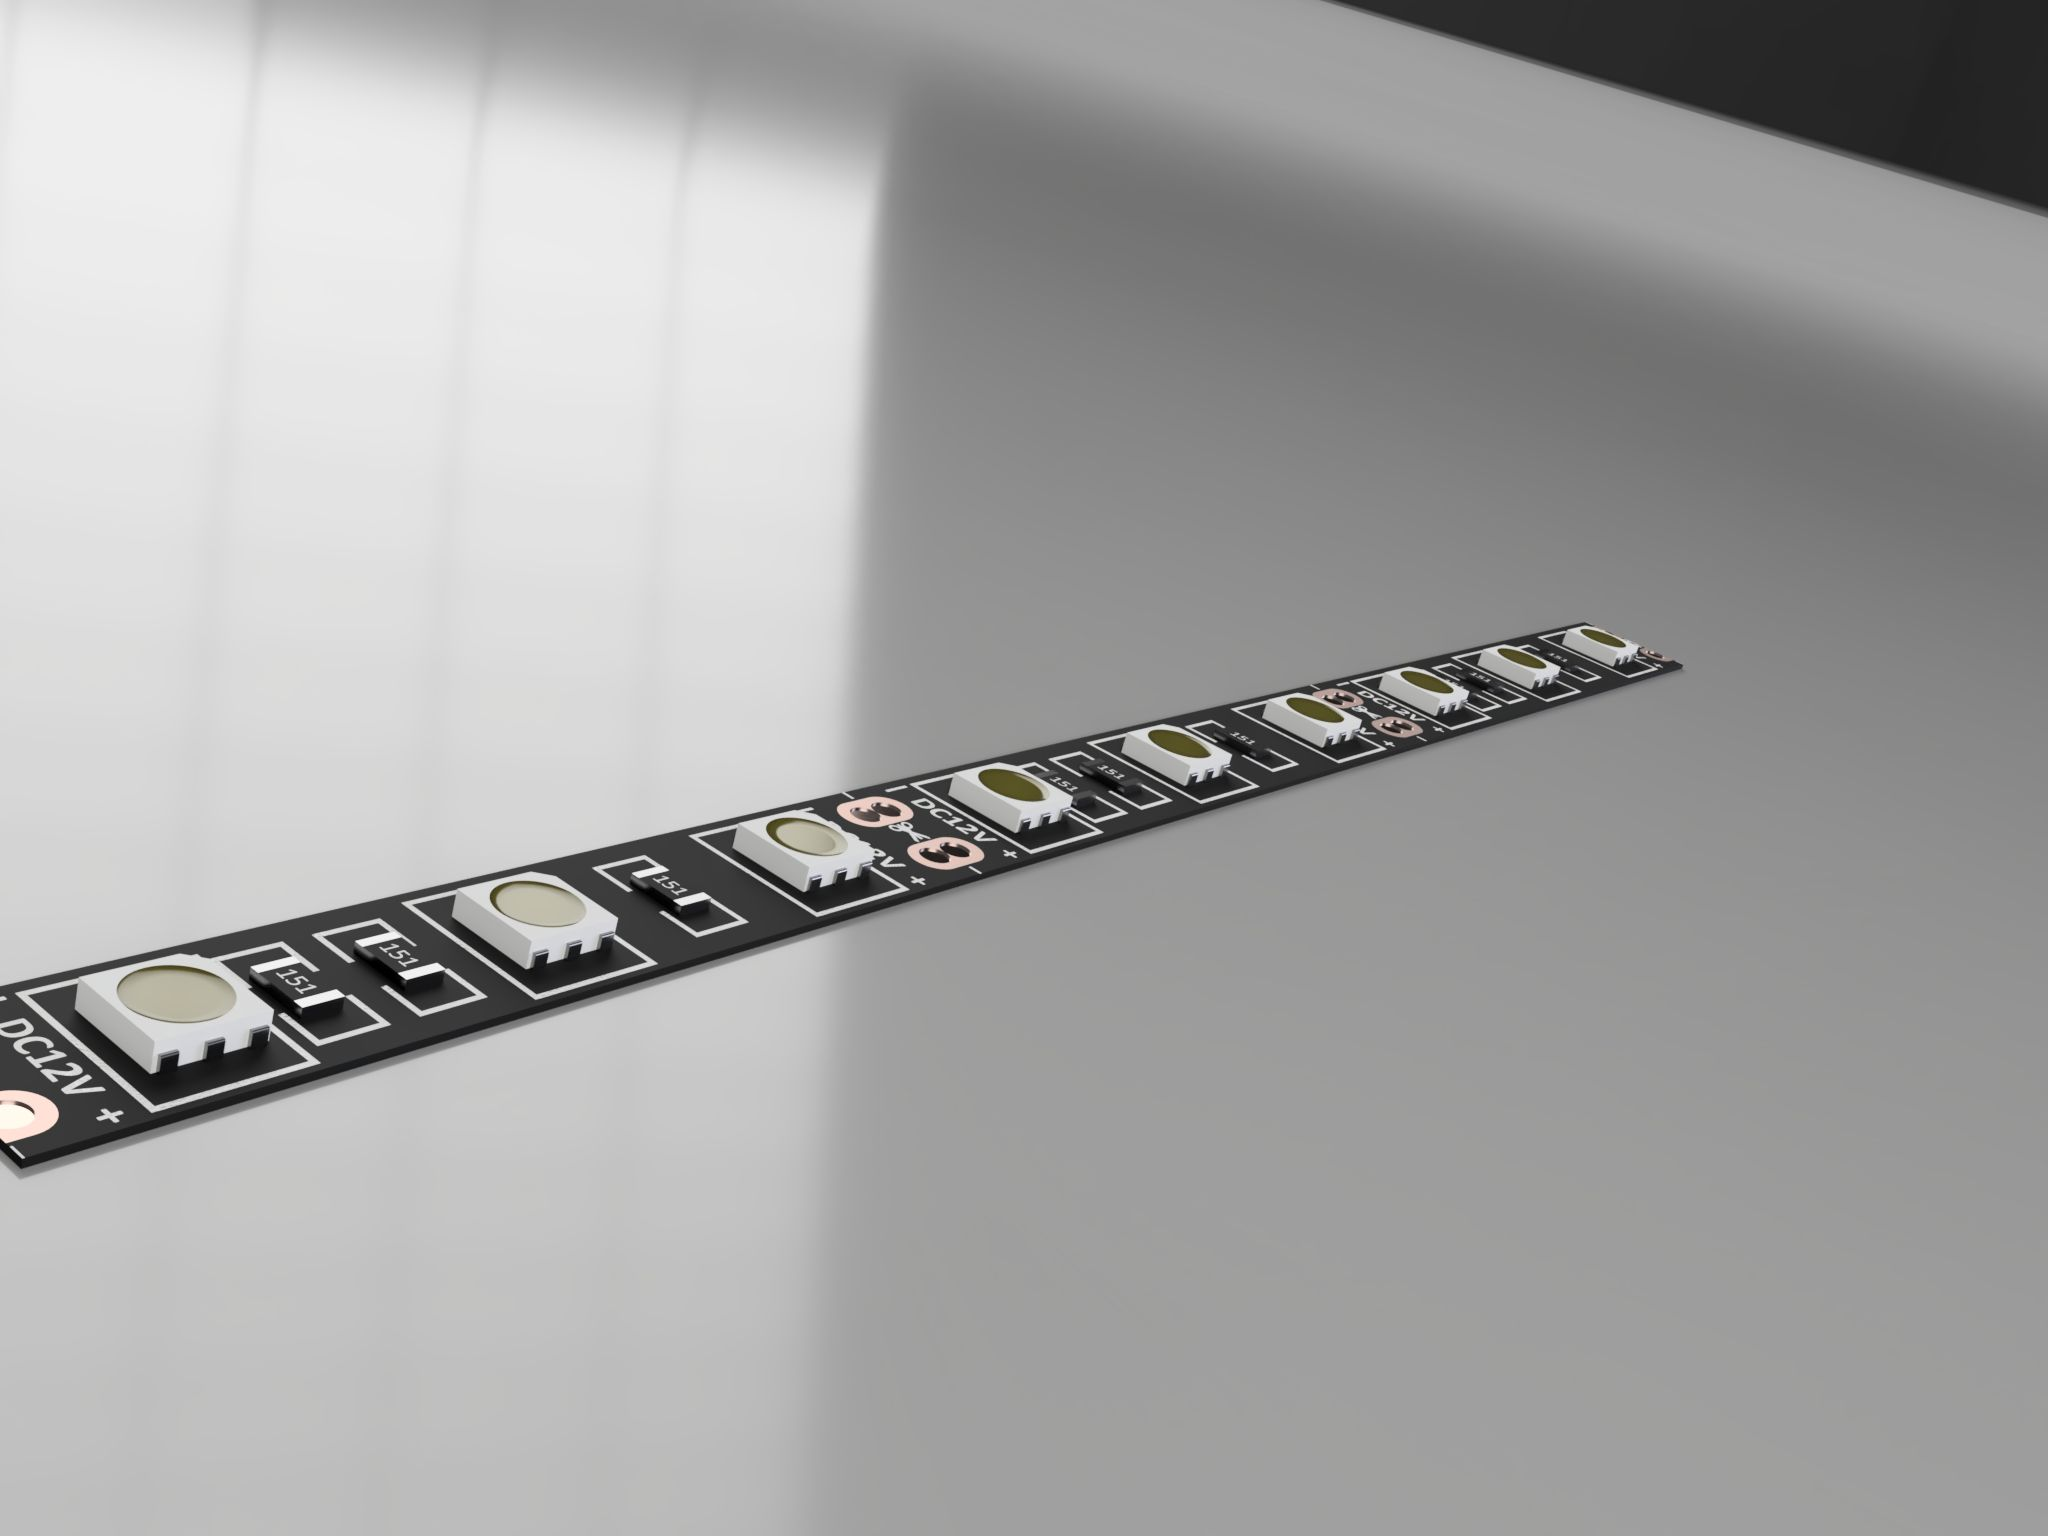 7-segments-5050-strip-leds-2017-dec-17-03-07-02pm-000-customizedview15343254729-3500-3500